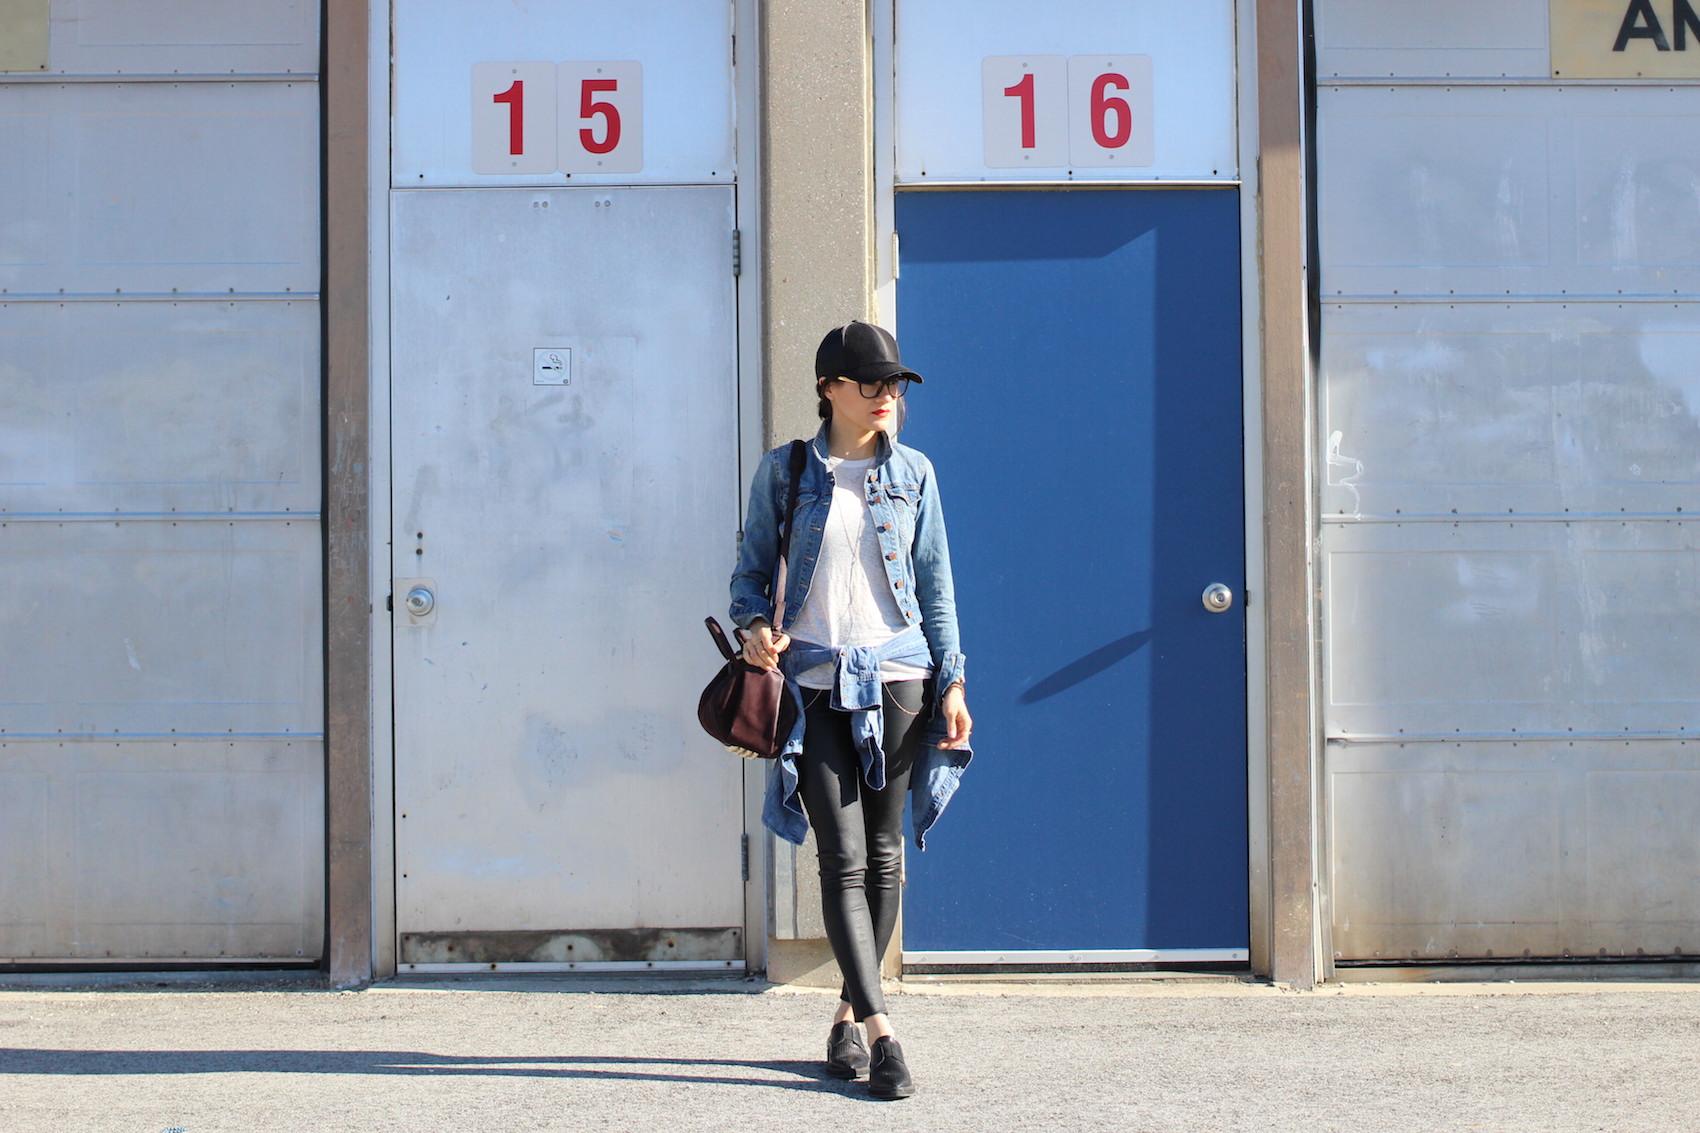 WoahStyle.com | Leather Mackage pants, Denim jacket, Alexander Wang Rockie, Helmut Land shoes and baseball cap.  #denimondenim #streetstyle